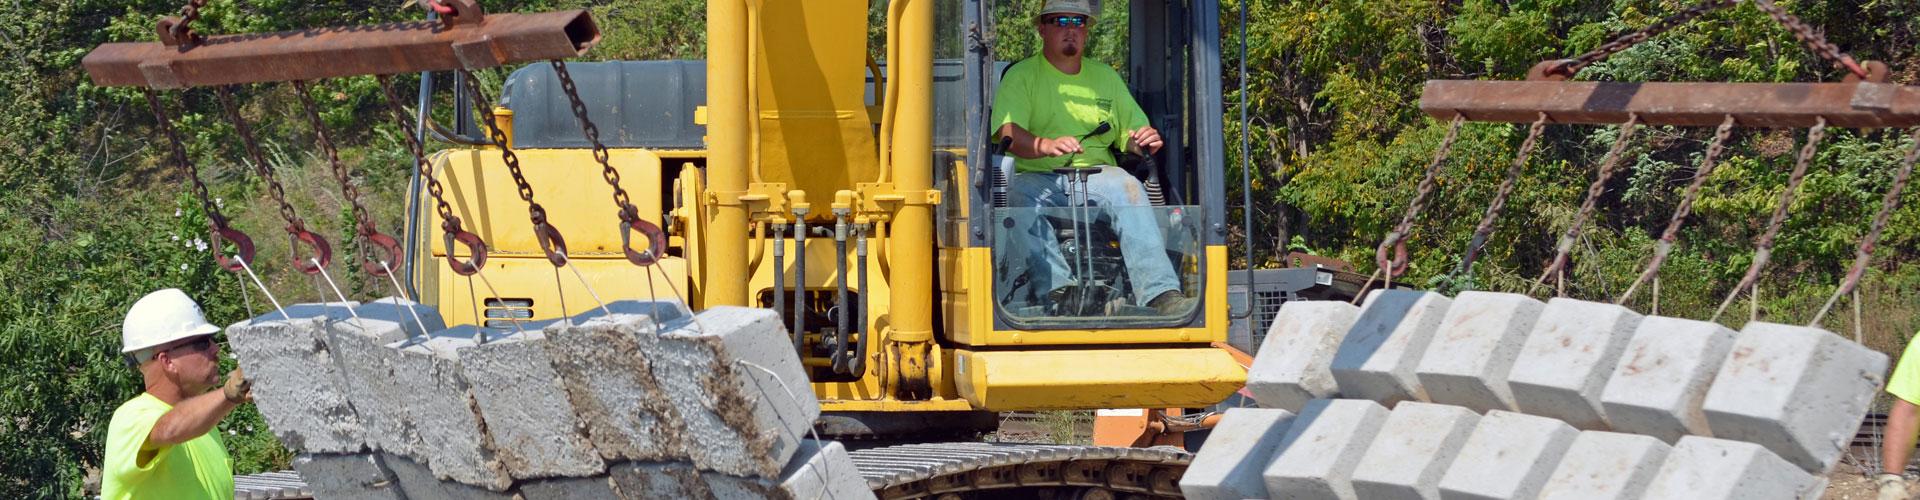 scour remediation, scour repairs, erosion control, precast articulating block mats